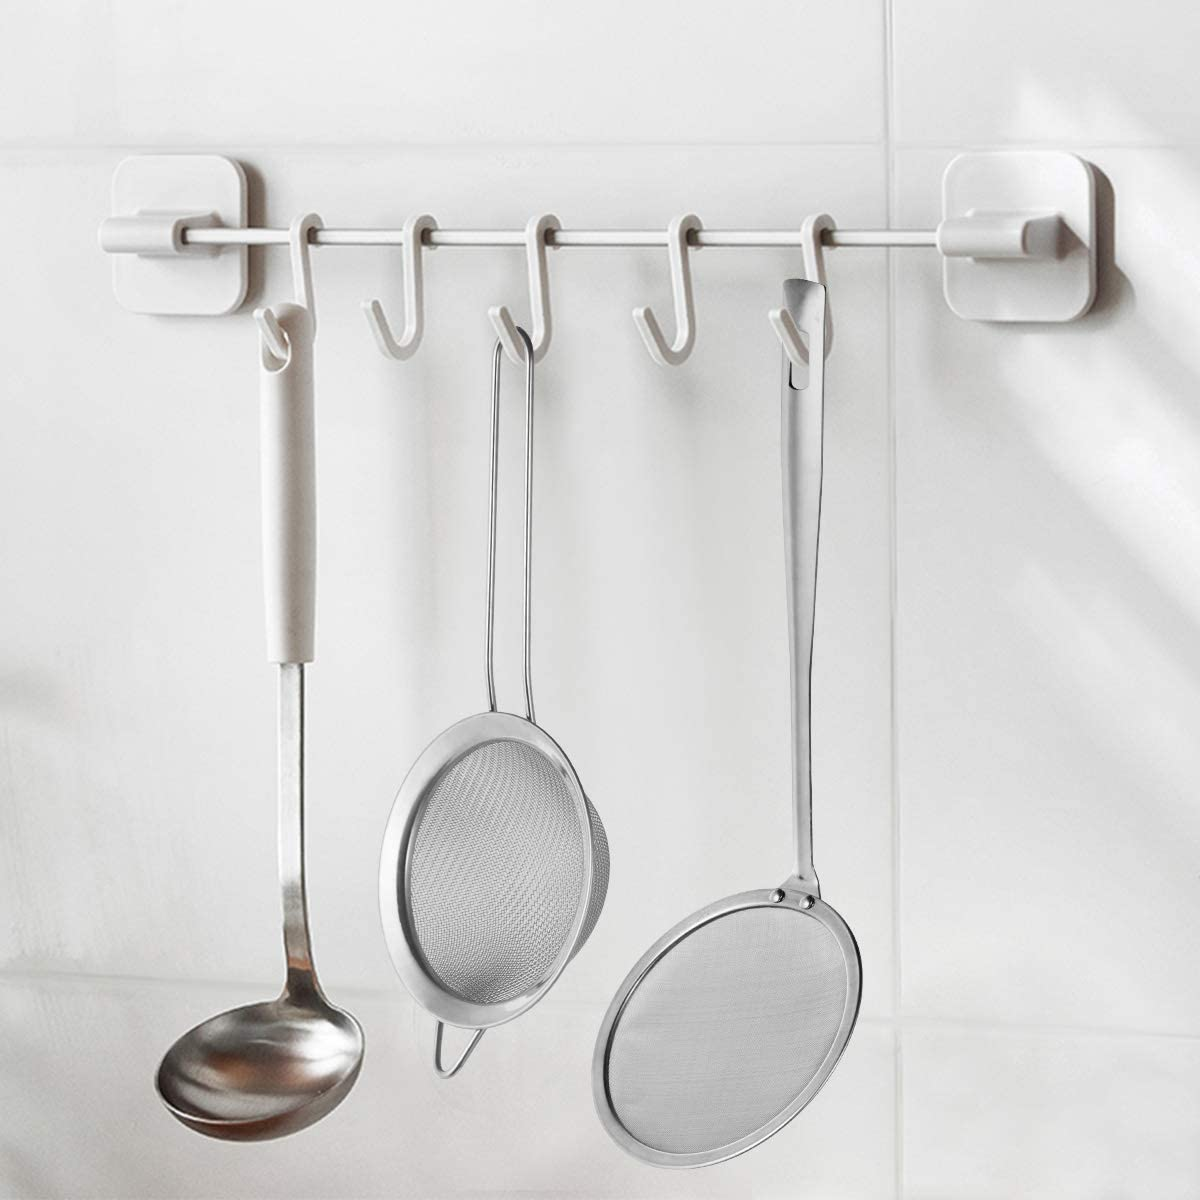 Stainless Steel Spoon Kitchen Utensils Soup Ladle Hotpot Colander 1X Sotds